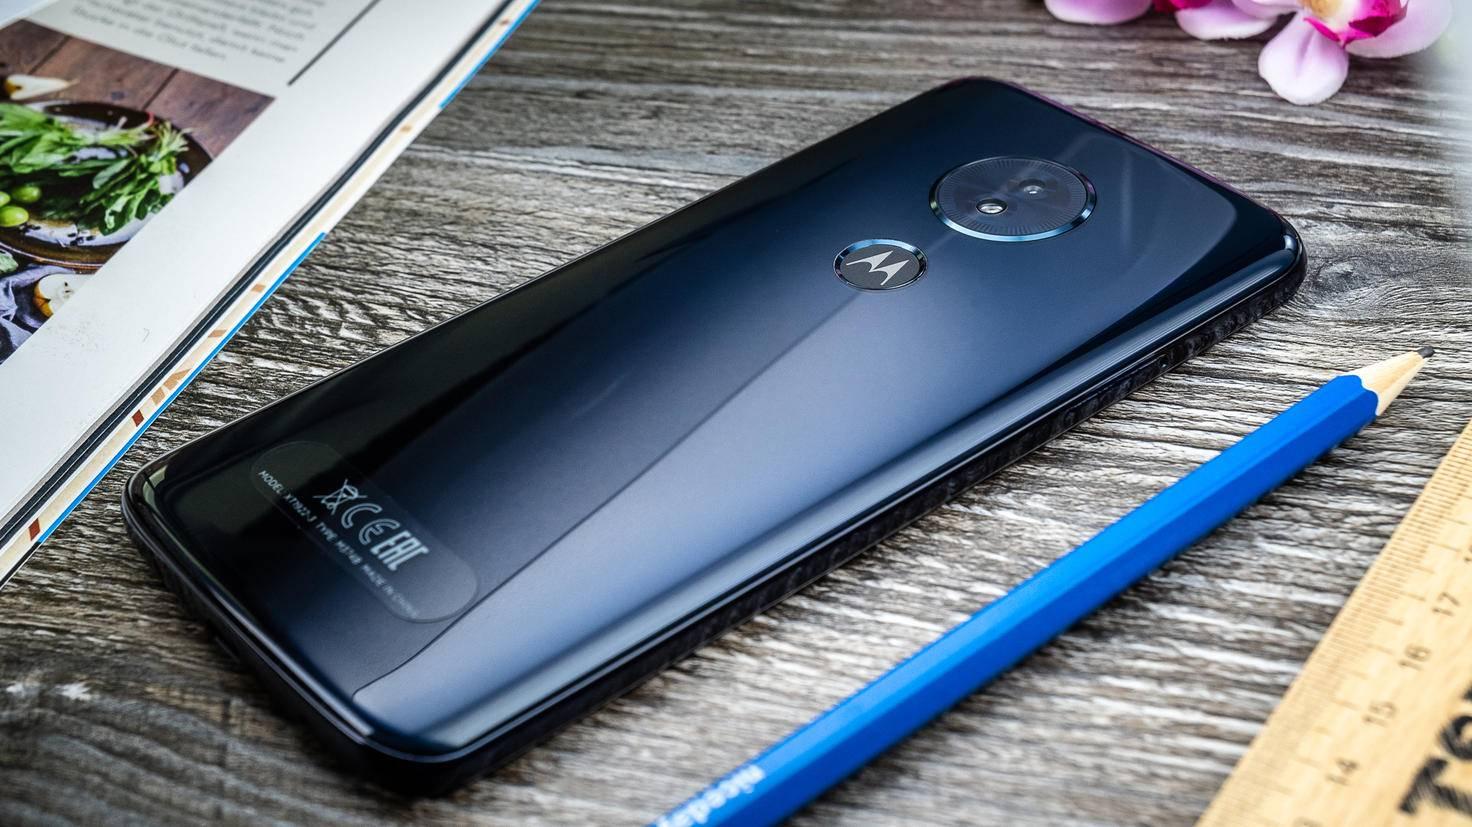 Motorola-Moto-G6-Play-TURN-ON-3